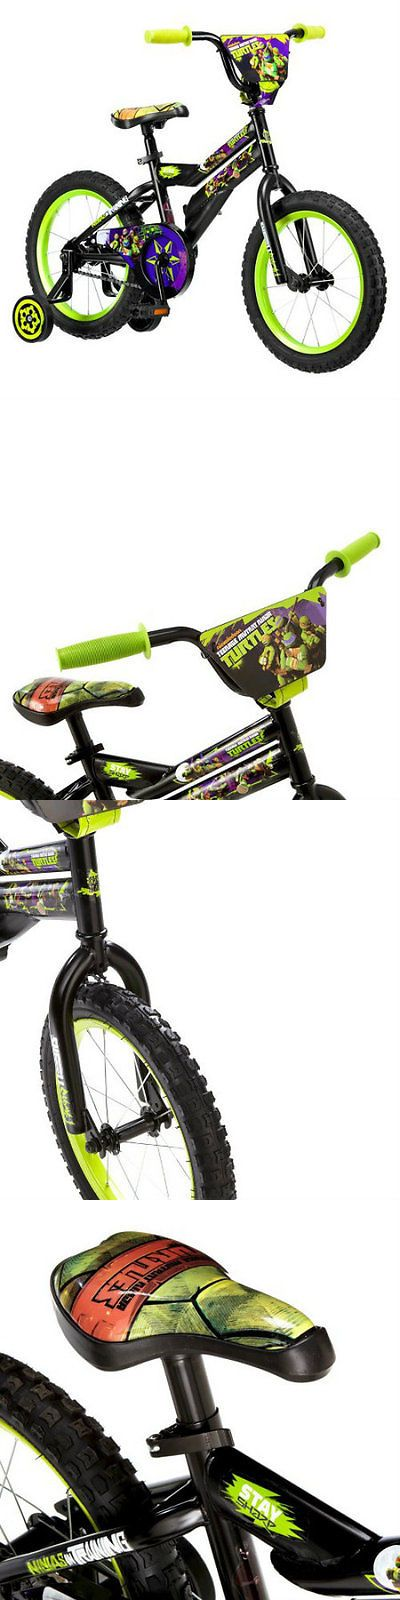 Training Wheels 177839: Nickelodeon Teenage Mutant Ninja Turtles Boys Bike Black Training Wheels Young -> BUY IT NOW ONLY: $97.99 on eBay!